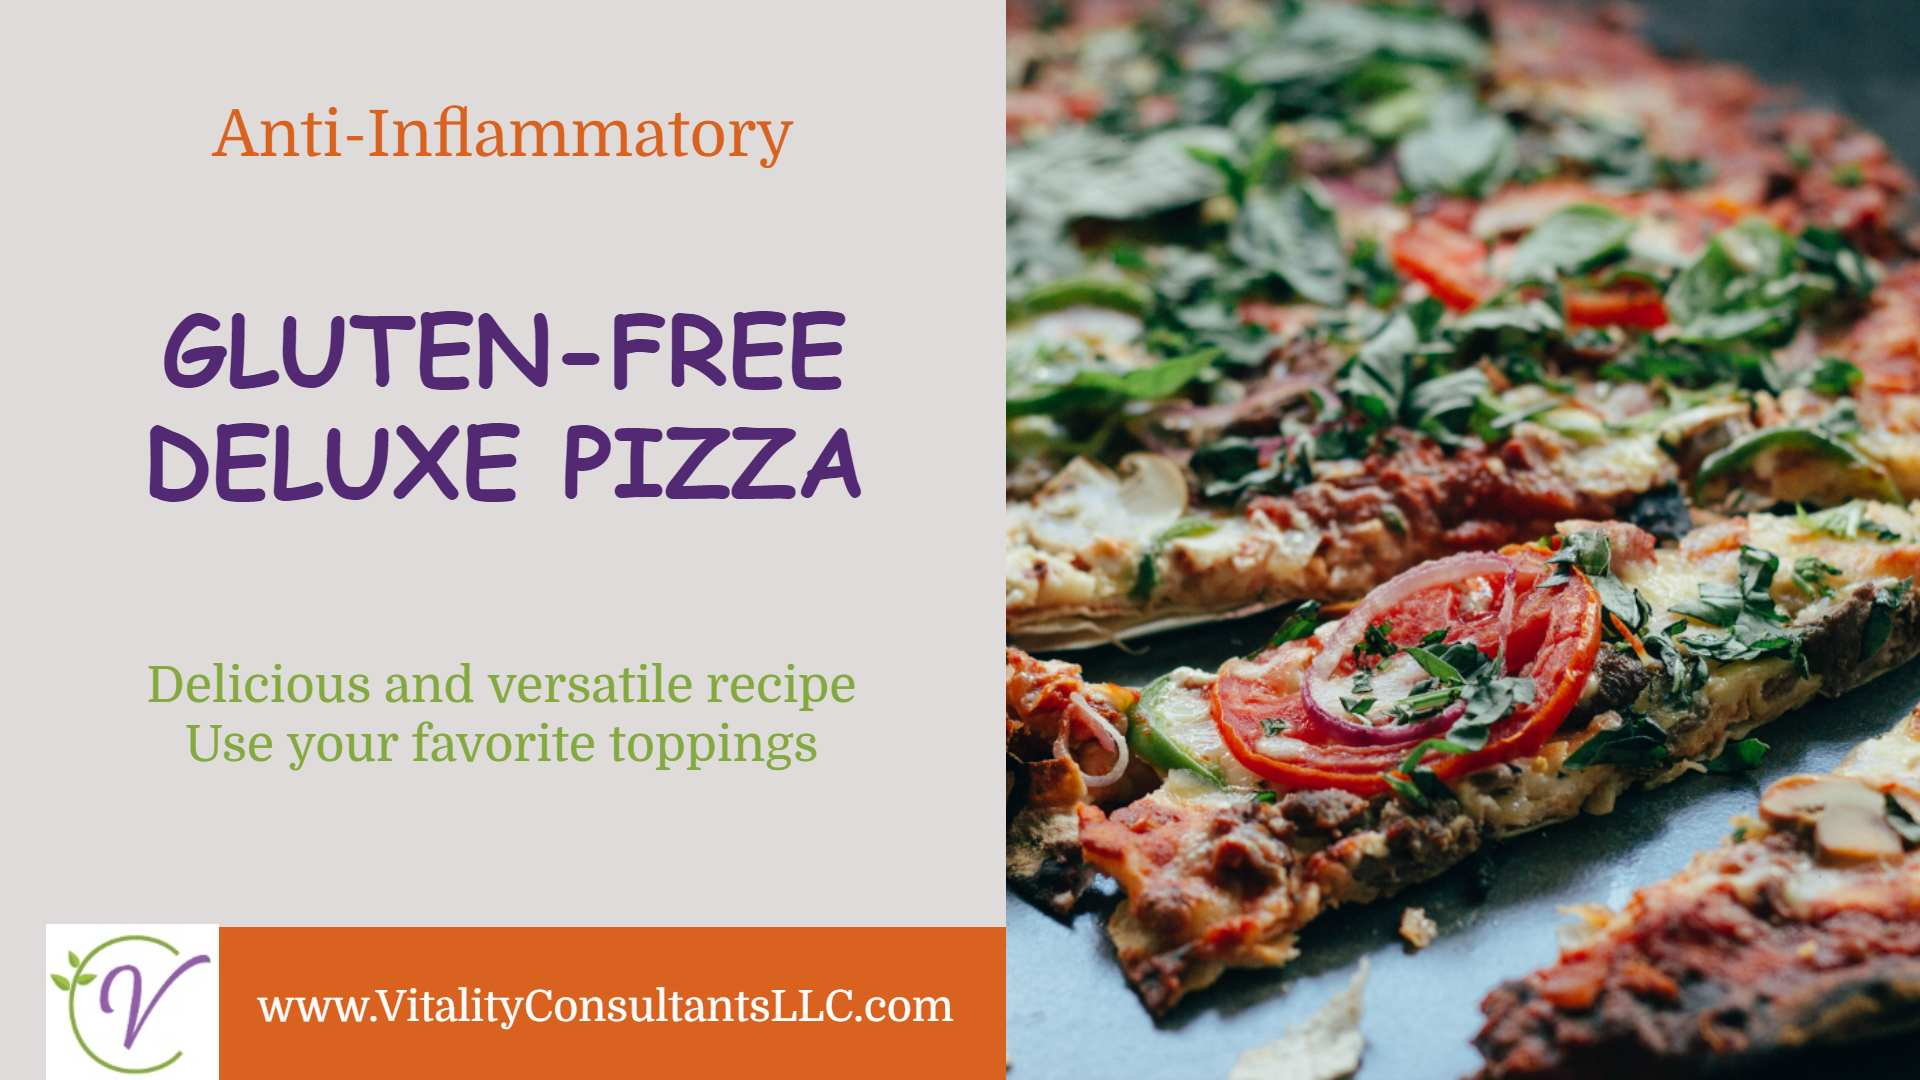 Deluxe Gluten-Free Pizza